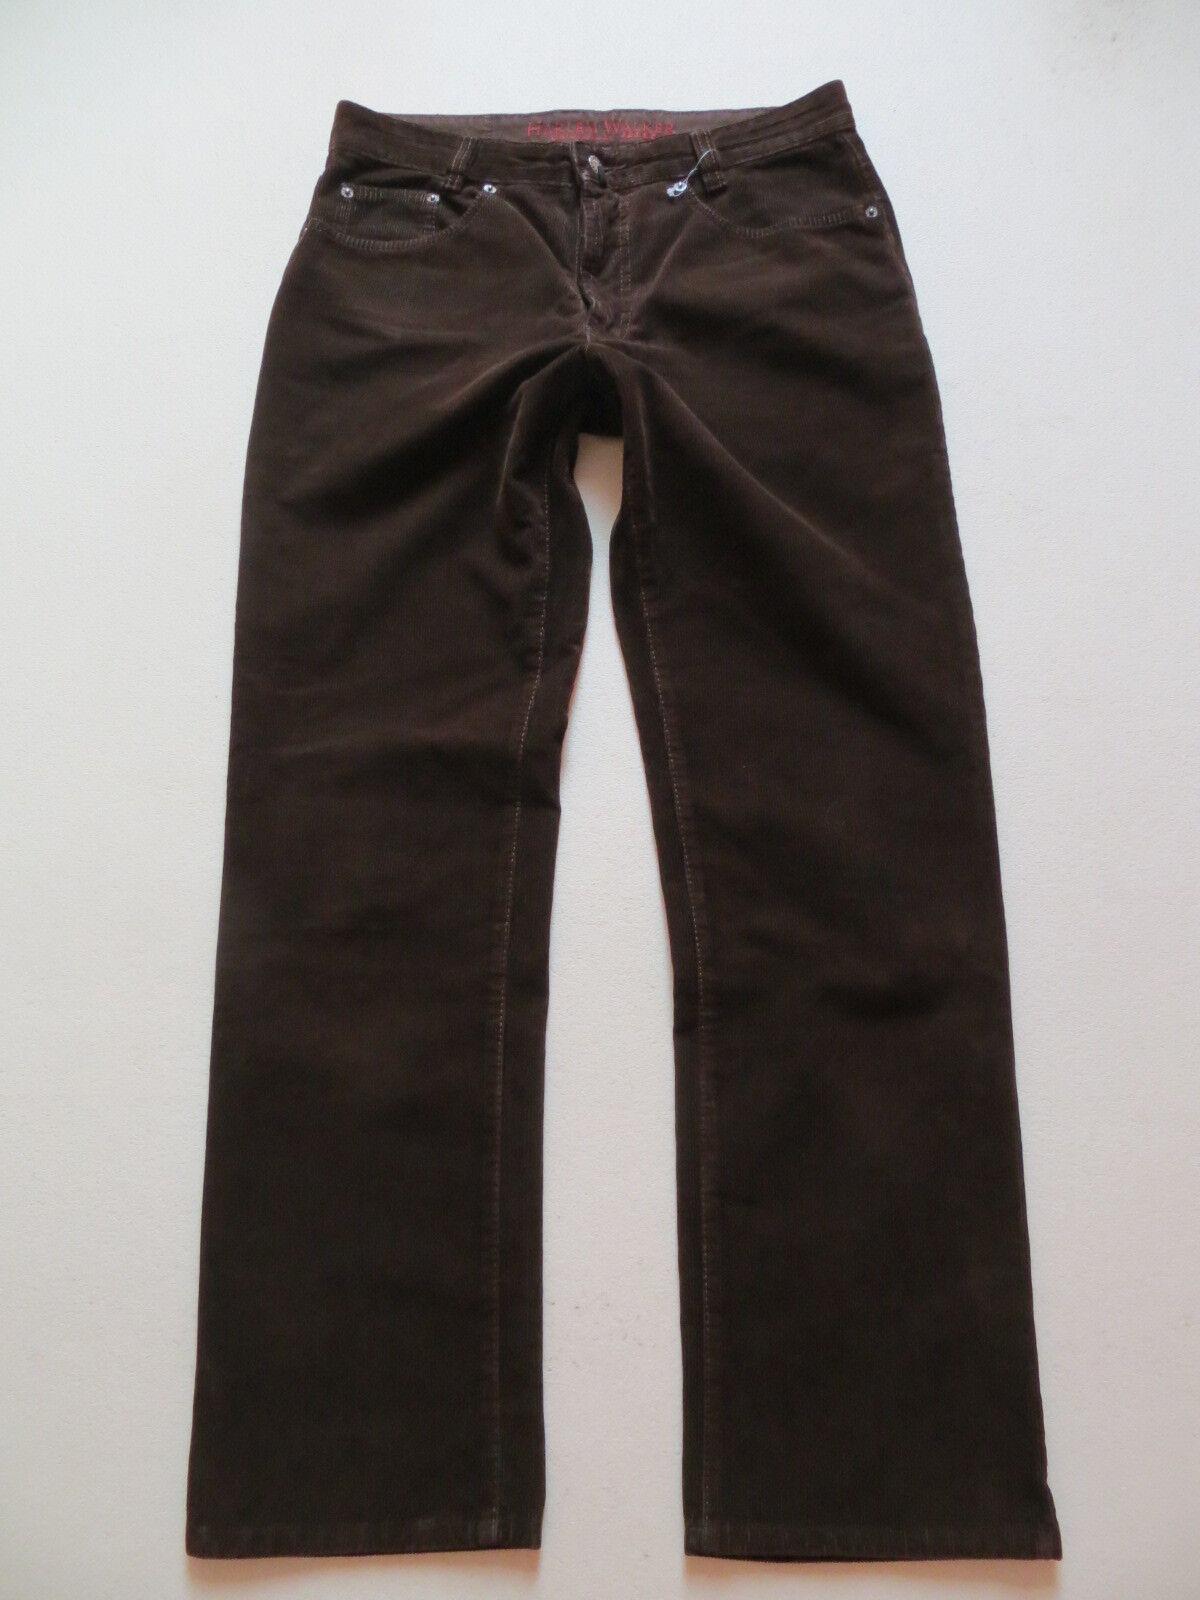 JOKER Jeans Harlem Walker Cord Hose W 33  L 32 brown, Hochwertig & Robust, RAR